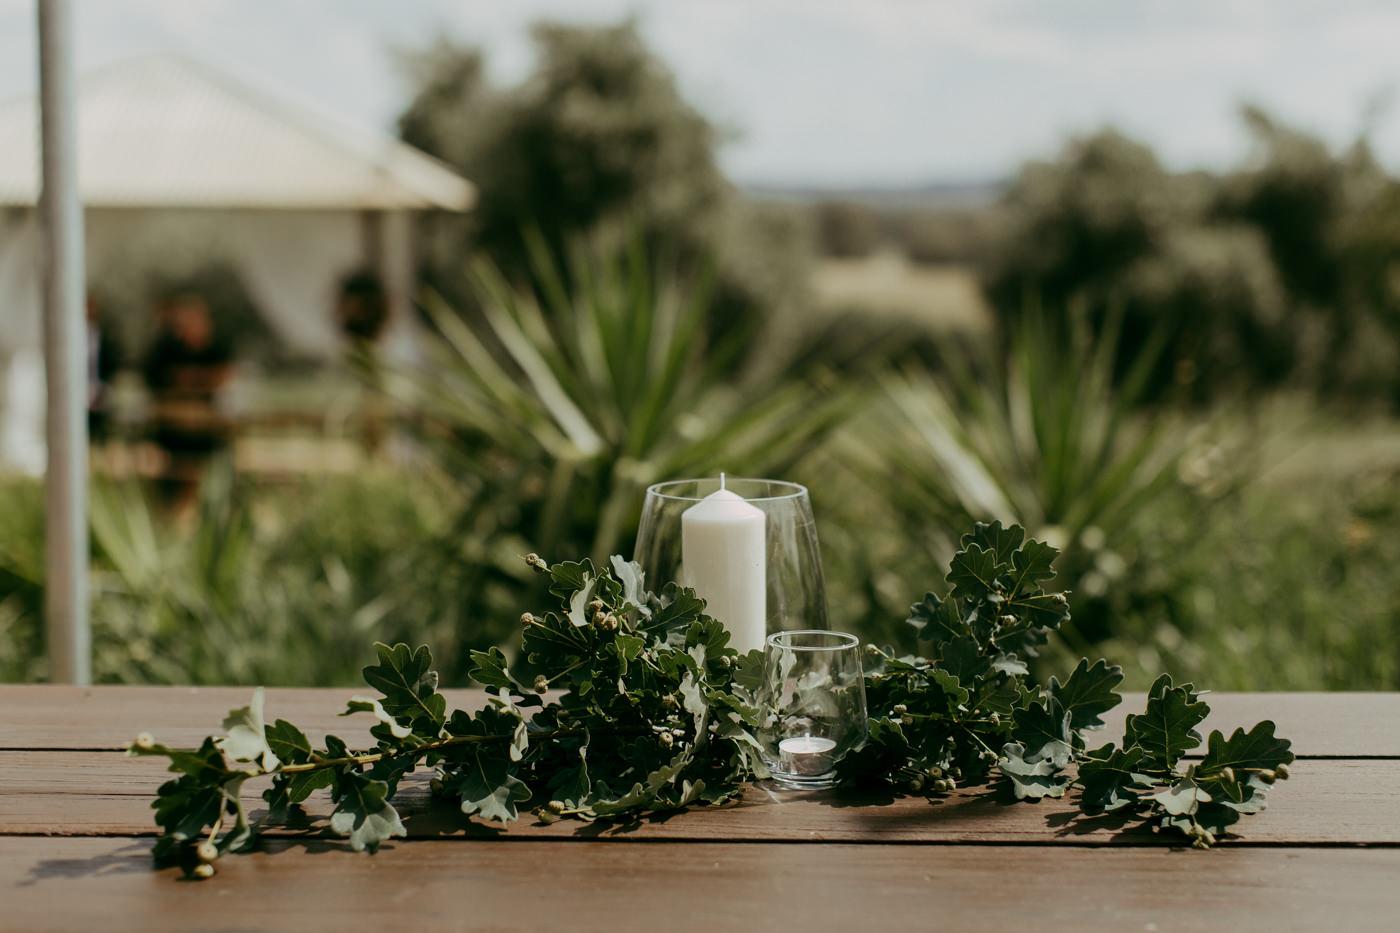 Anthony & Eliet - Wagga Wagga Wedding - Country NSW - Samantha Heather Photography-88.jpg